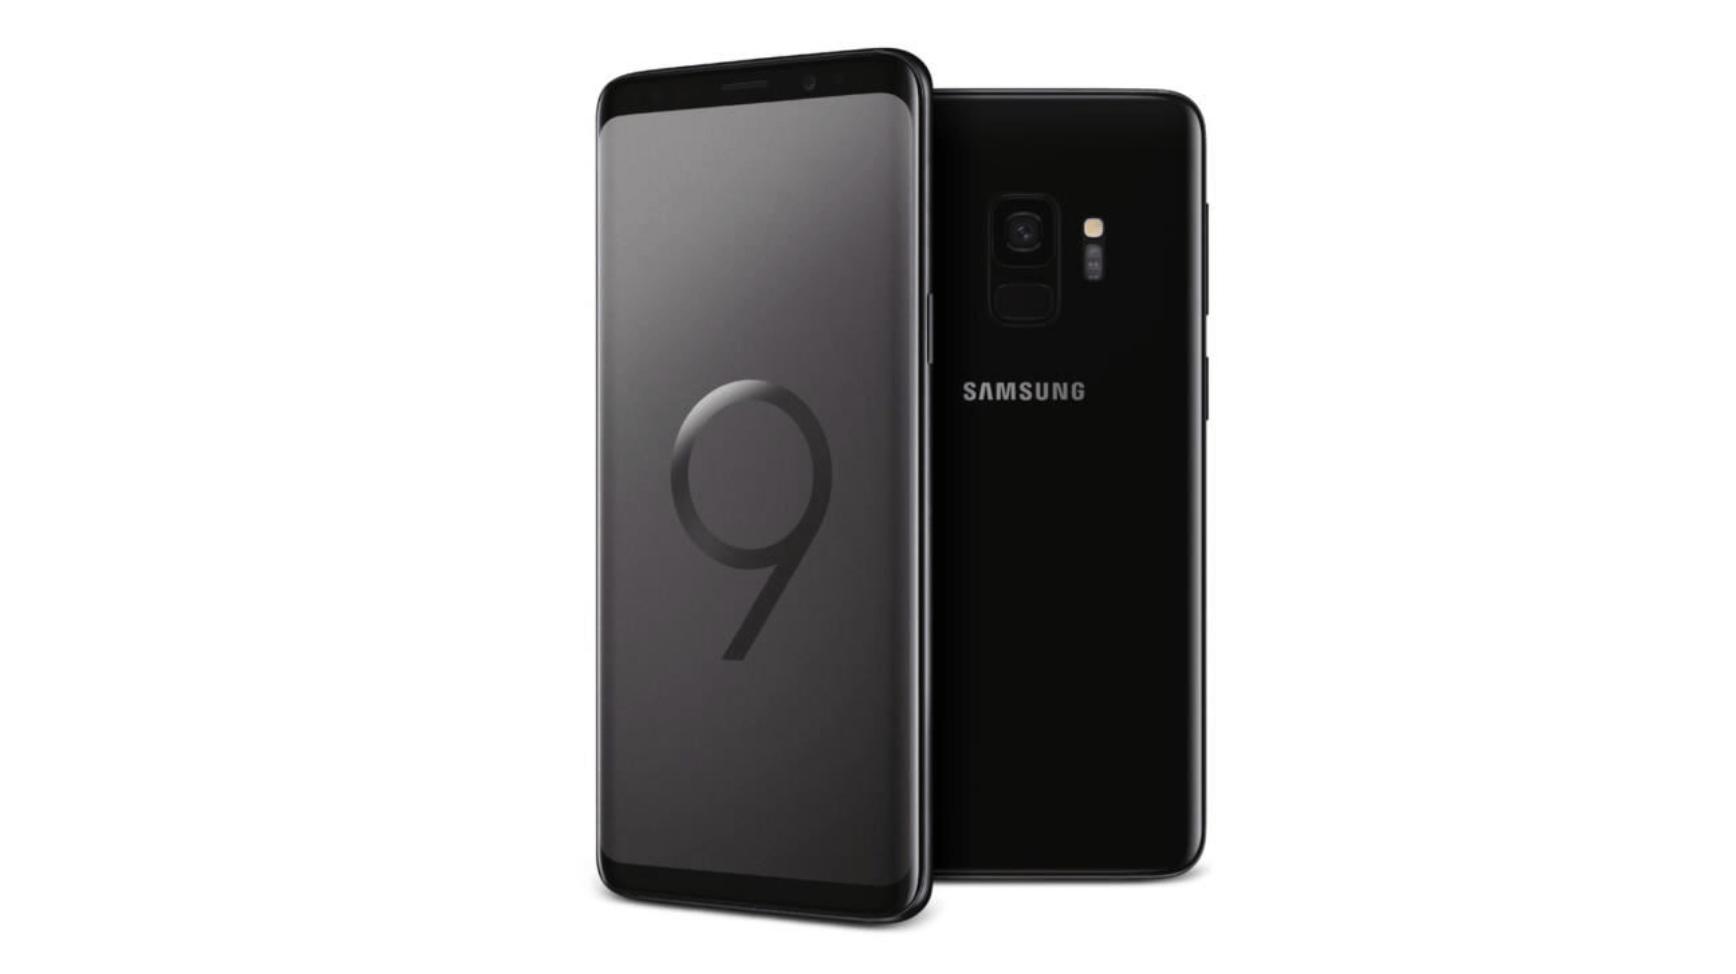 🔥 Baisse de prix : le Galaxy S9 à 489 euros en 64 Go et 559 euros en 256 Go